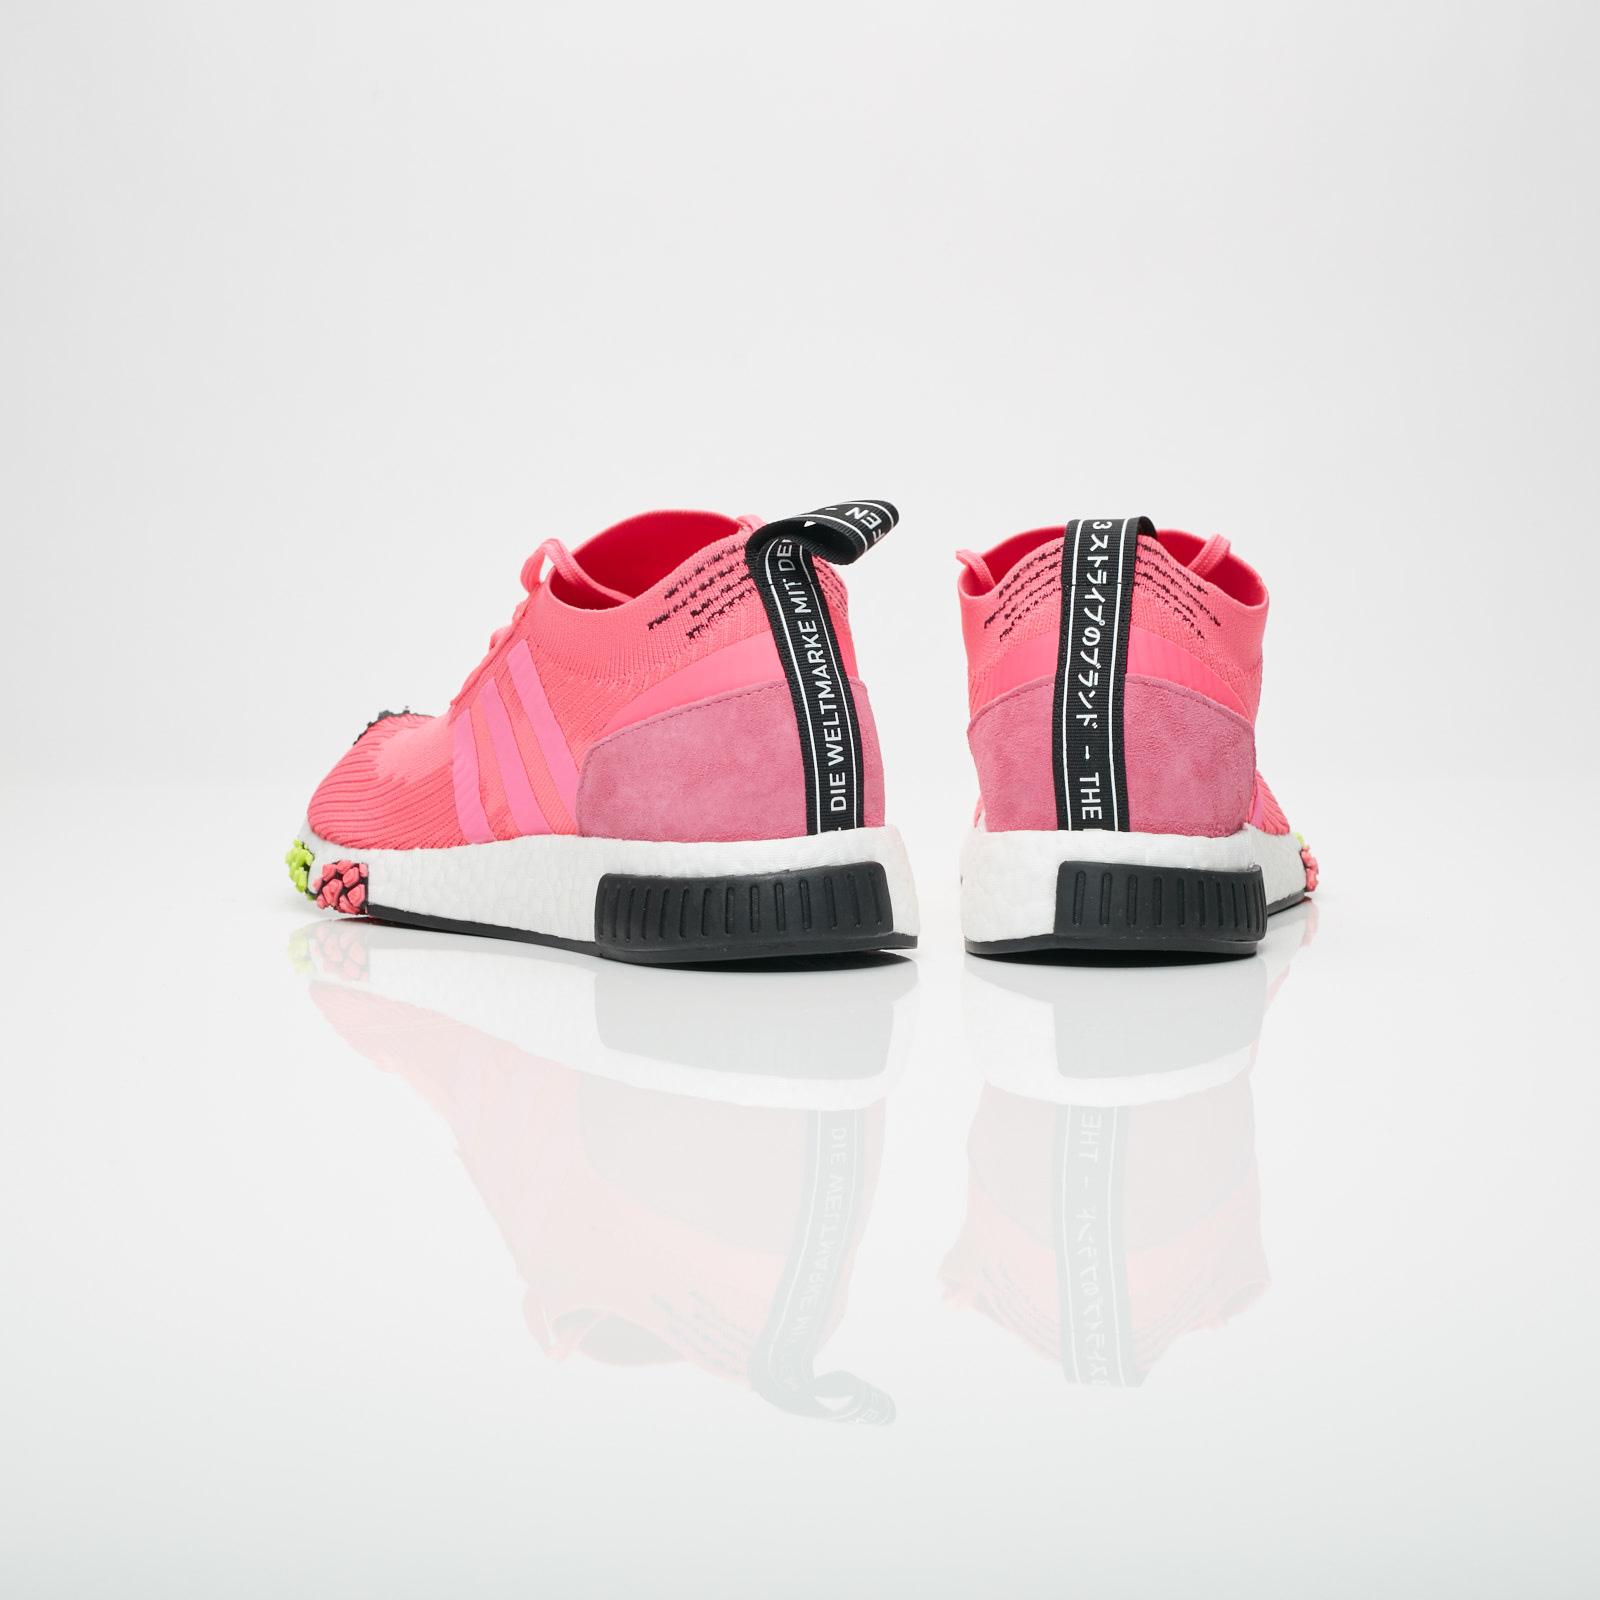 9a148fe26badf adidas NMD Racer PK - Cq2442 - Sneakersnstuff